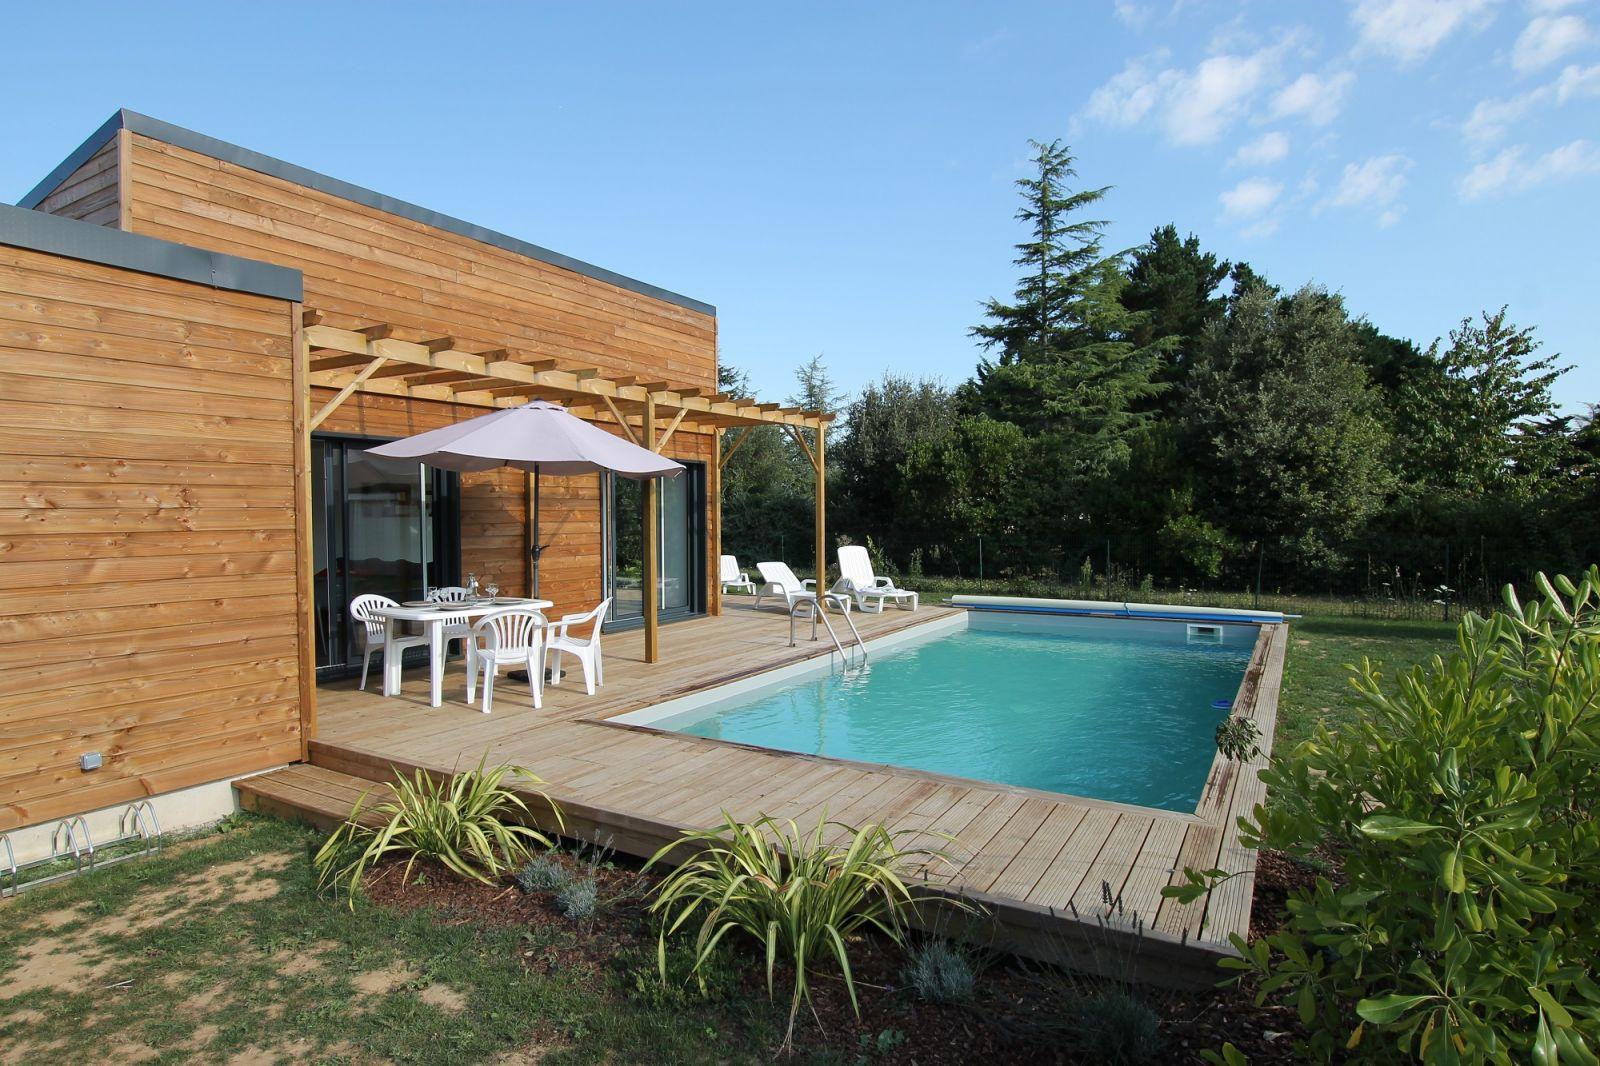 Maison Bois Moderne - Maison Moderne Bois u2013 Maison Moderne